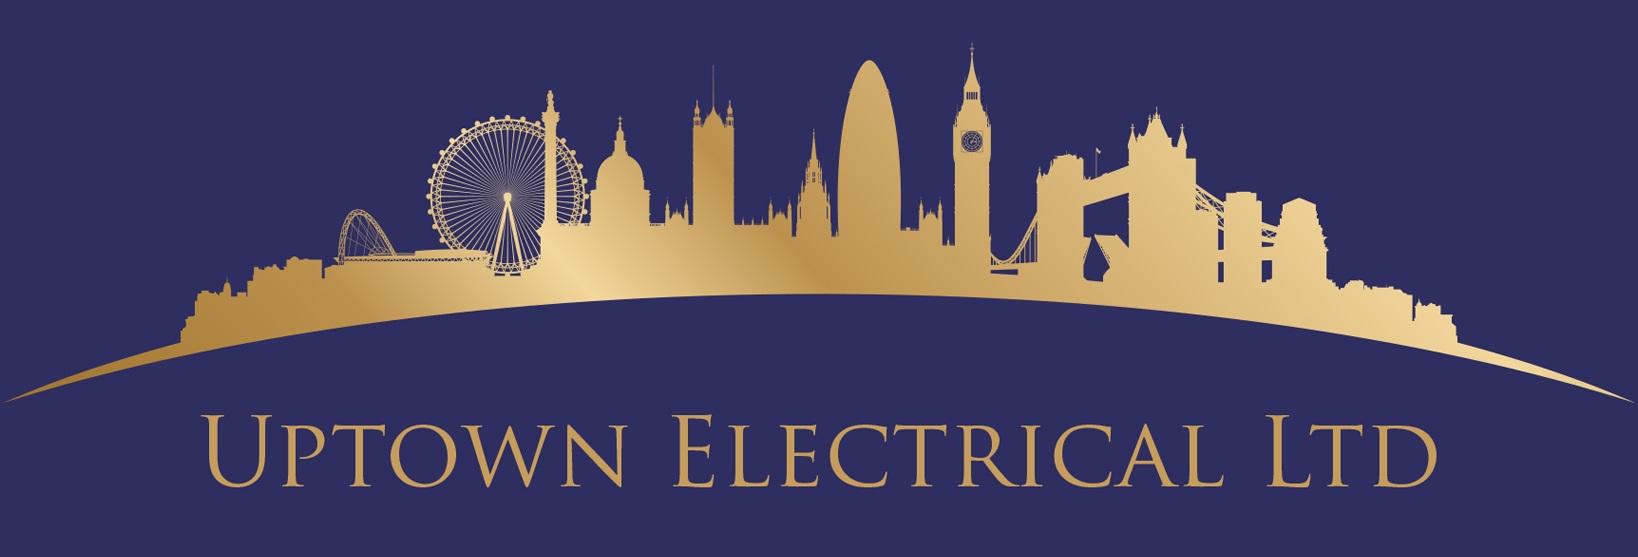 Uptown Electrical Ltd Verified Logo